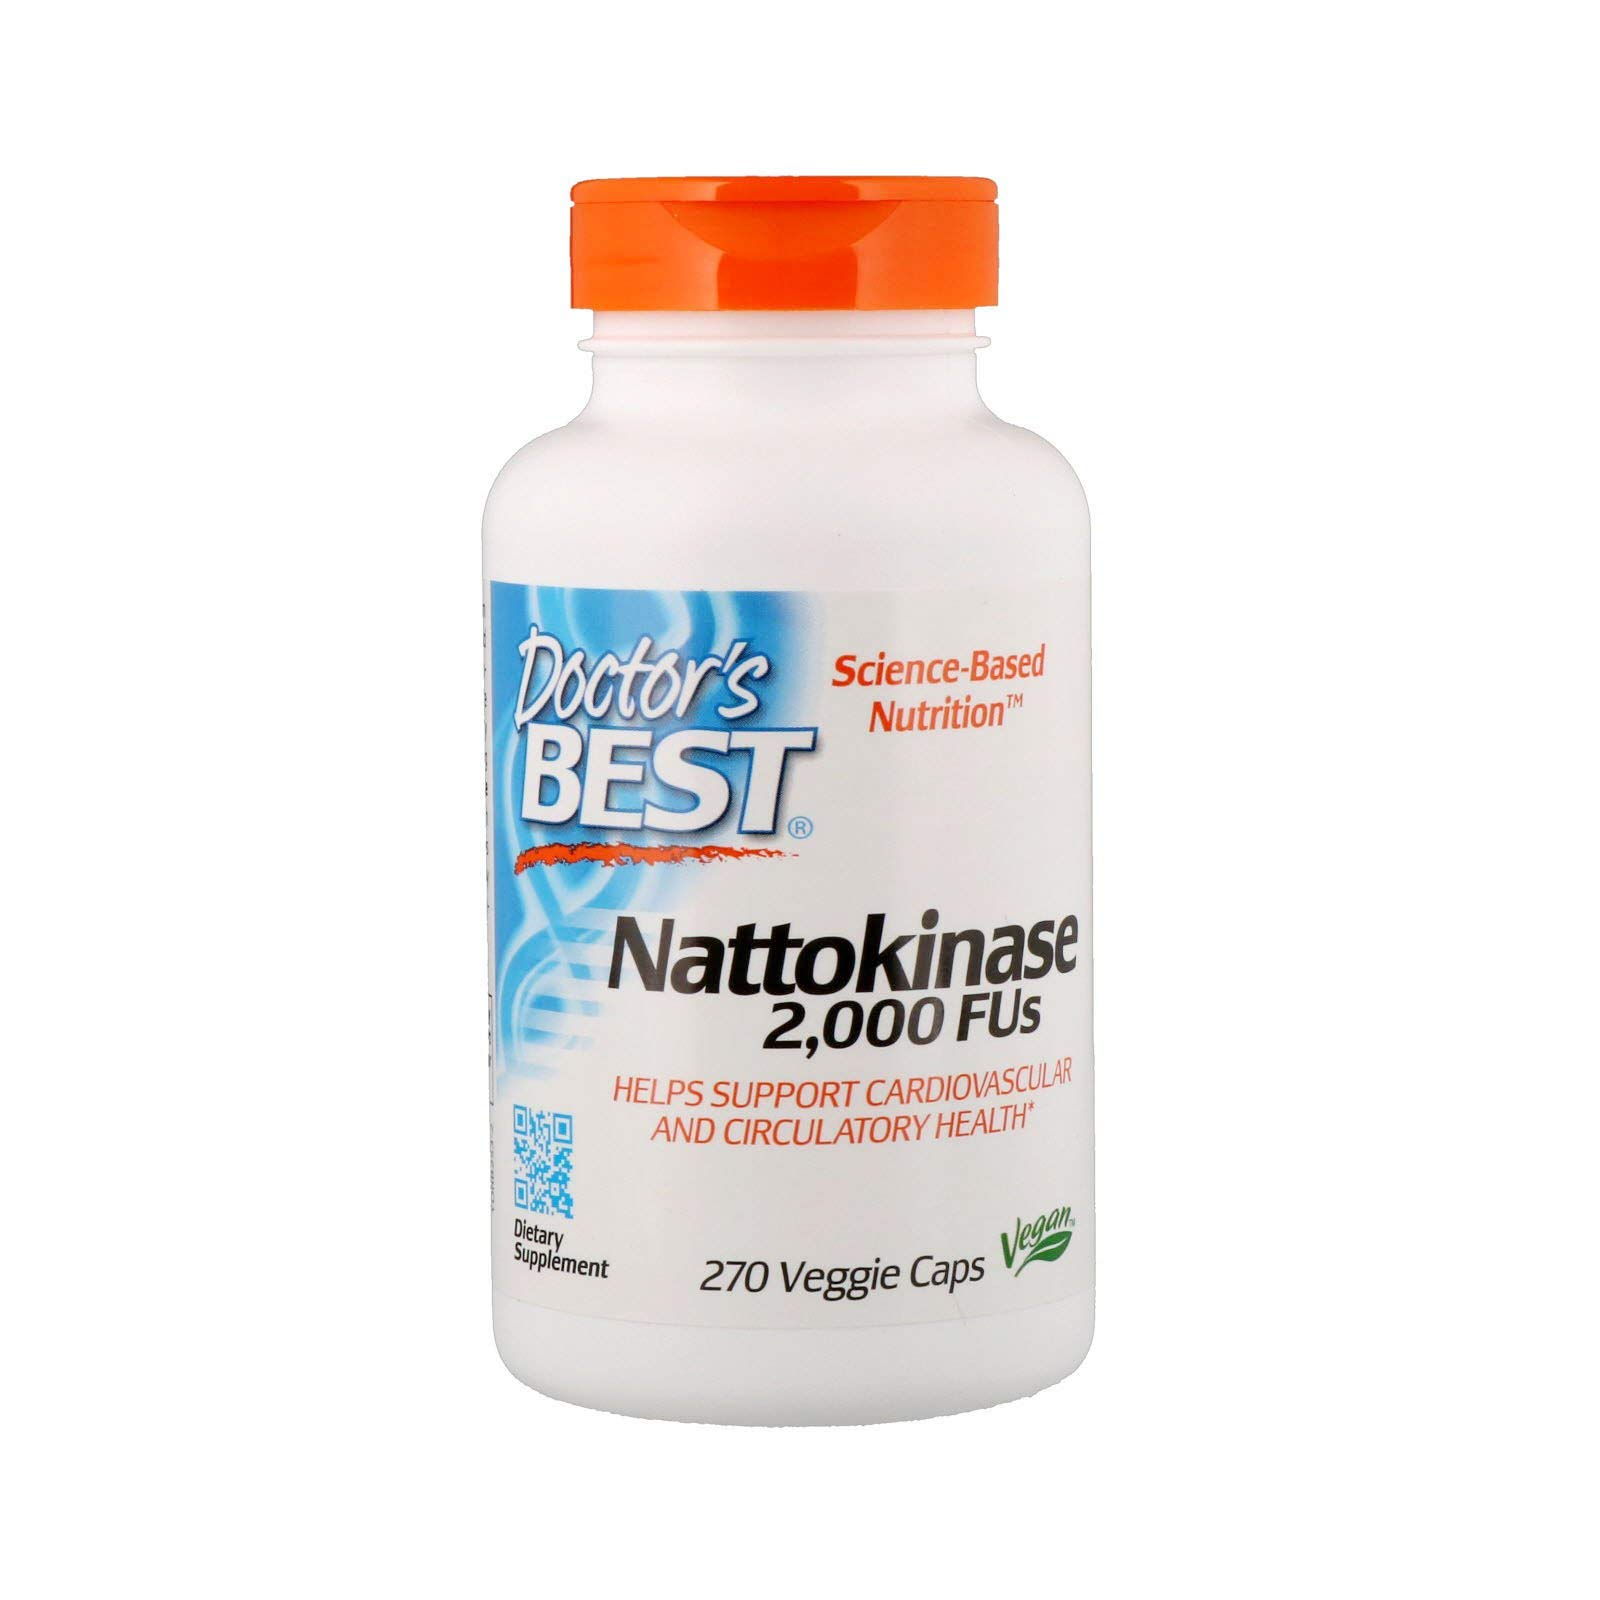 Doctor's Best Nattokinase - 270 ct (Pack of 2)